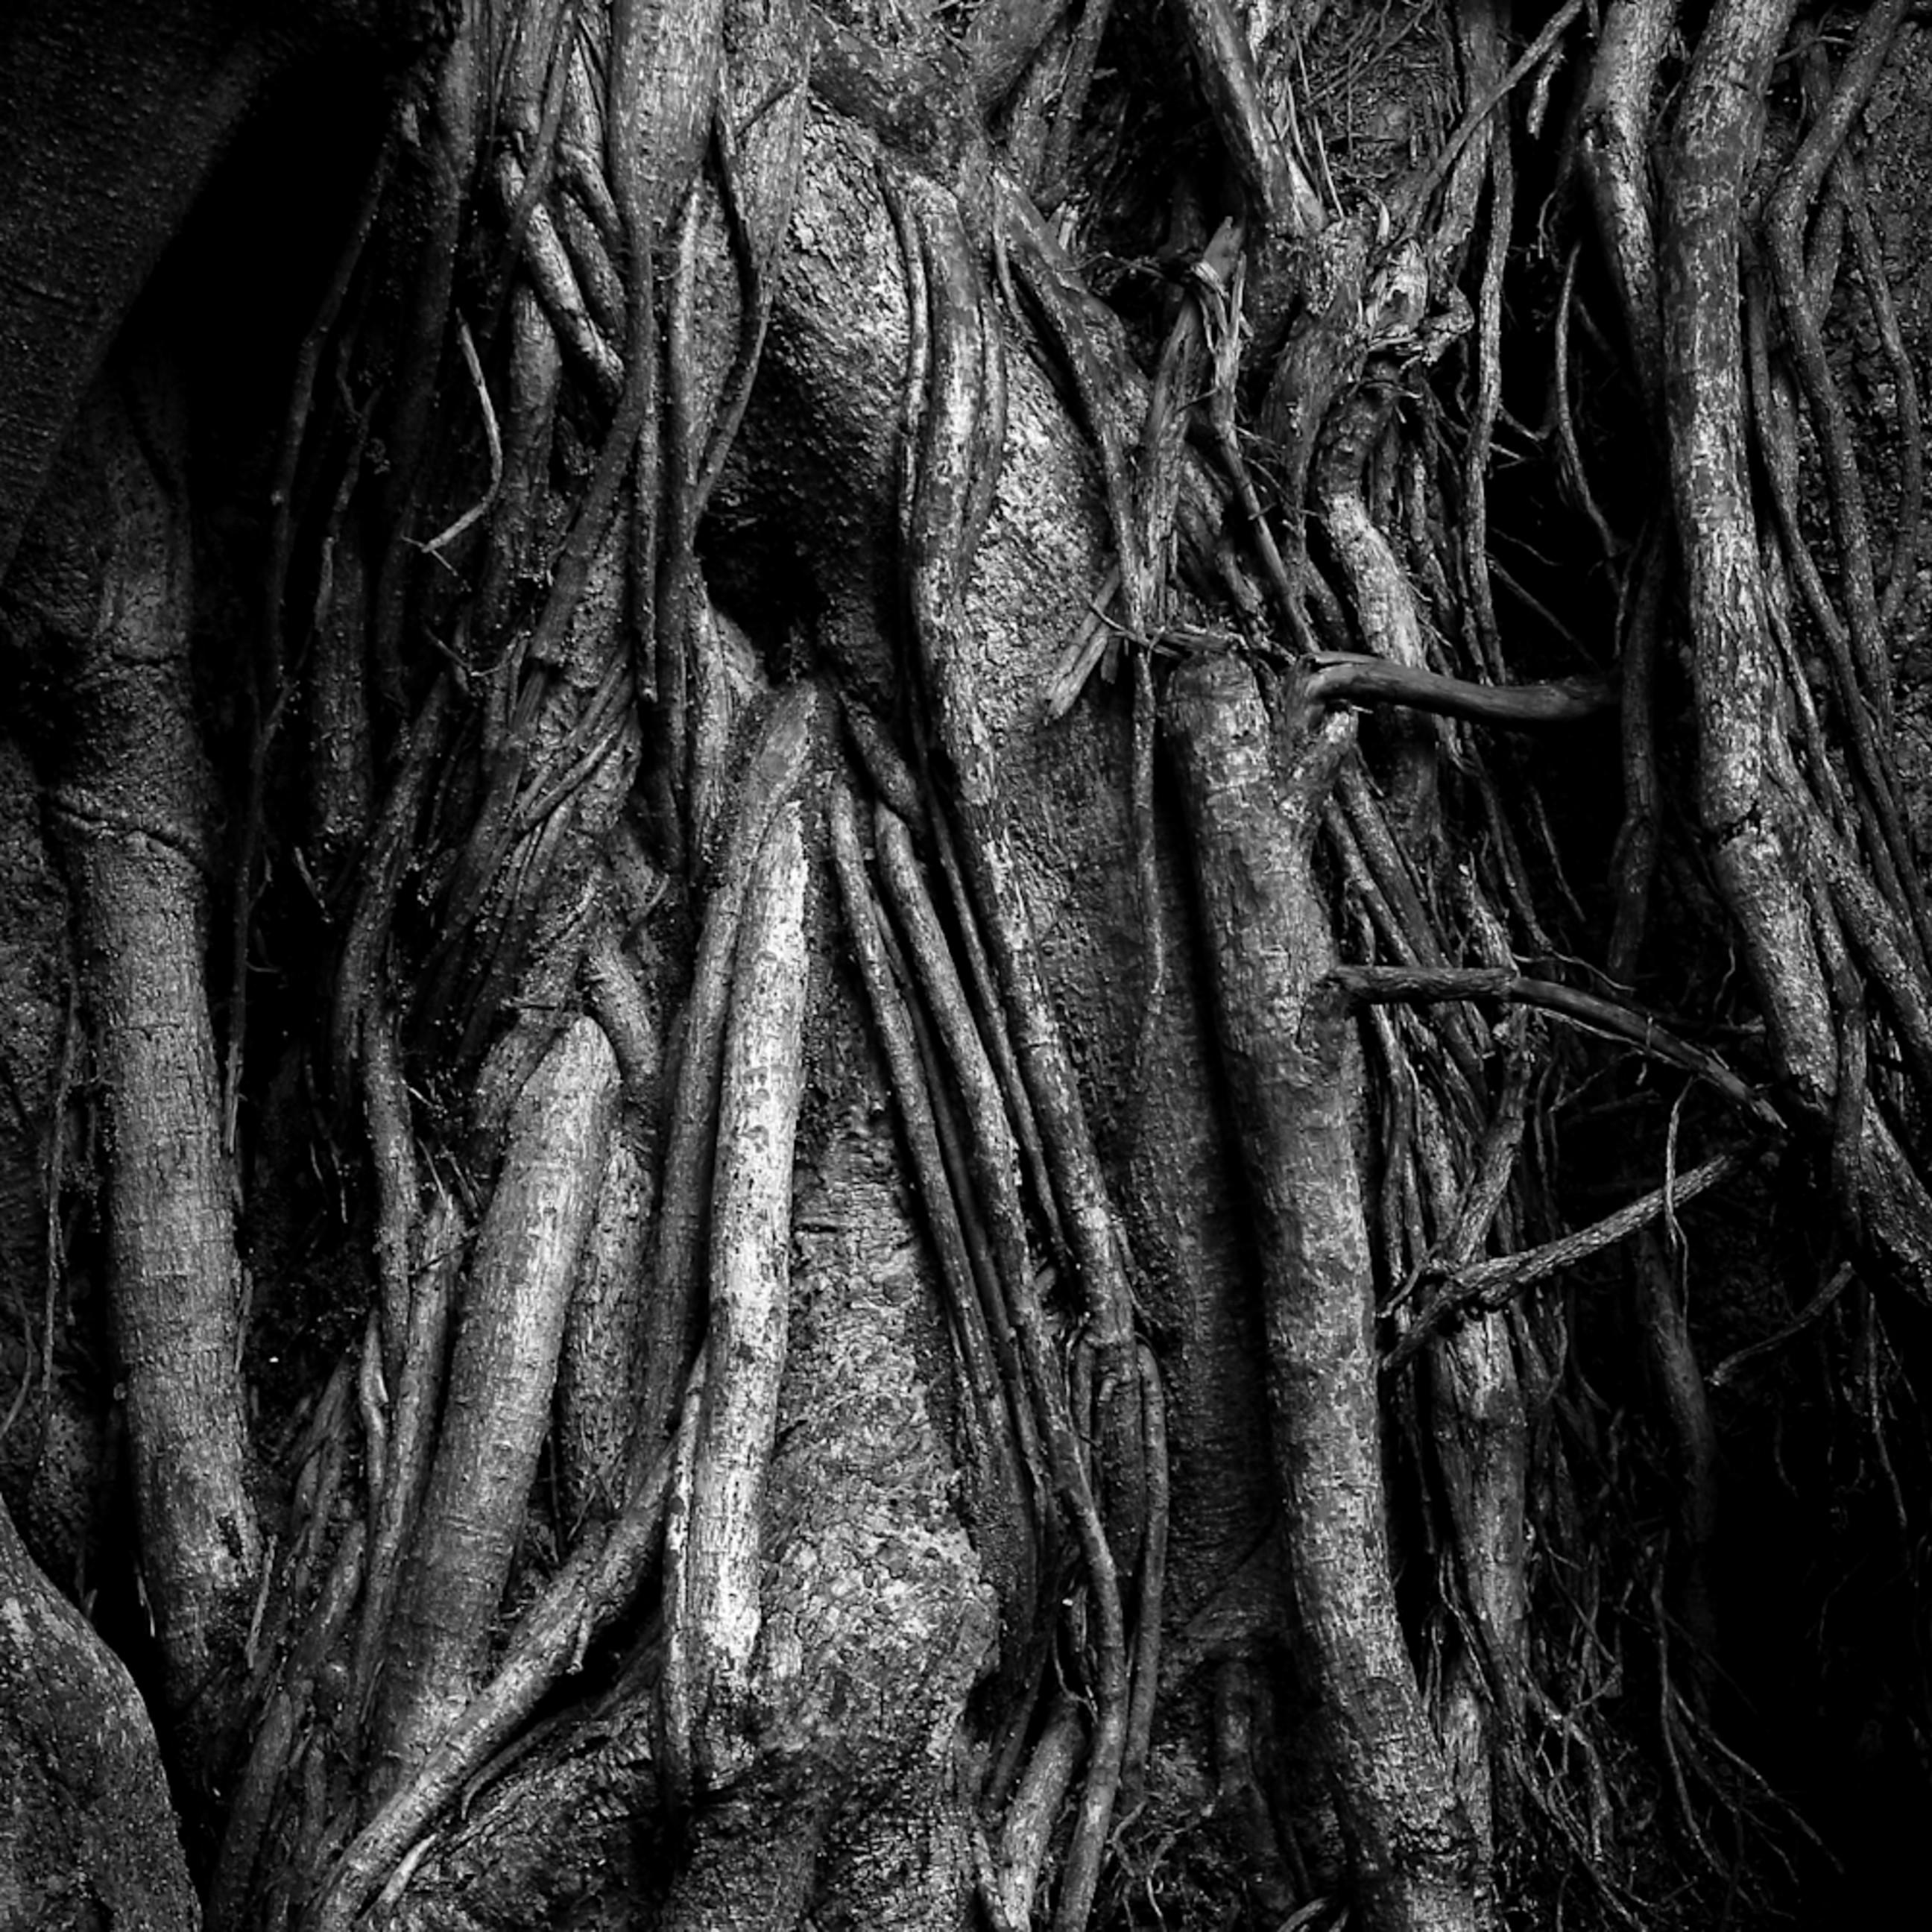 Hanging roots maui izopyy